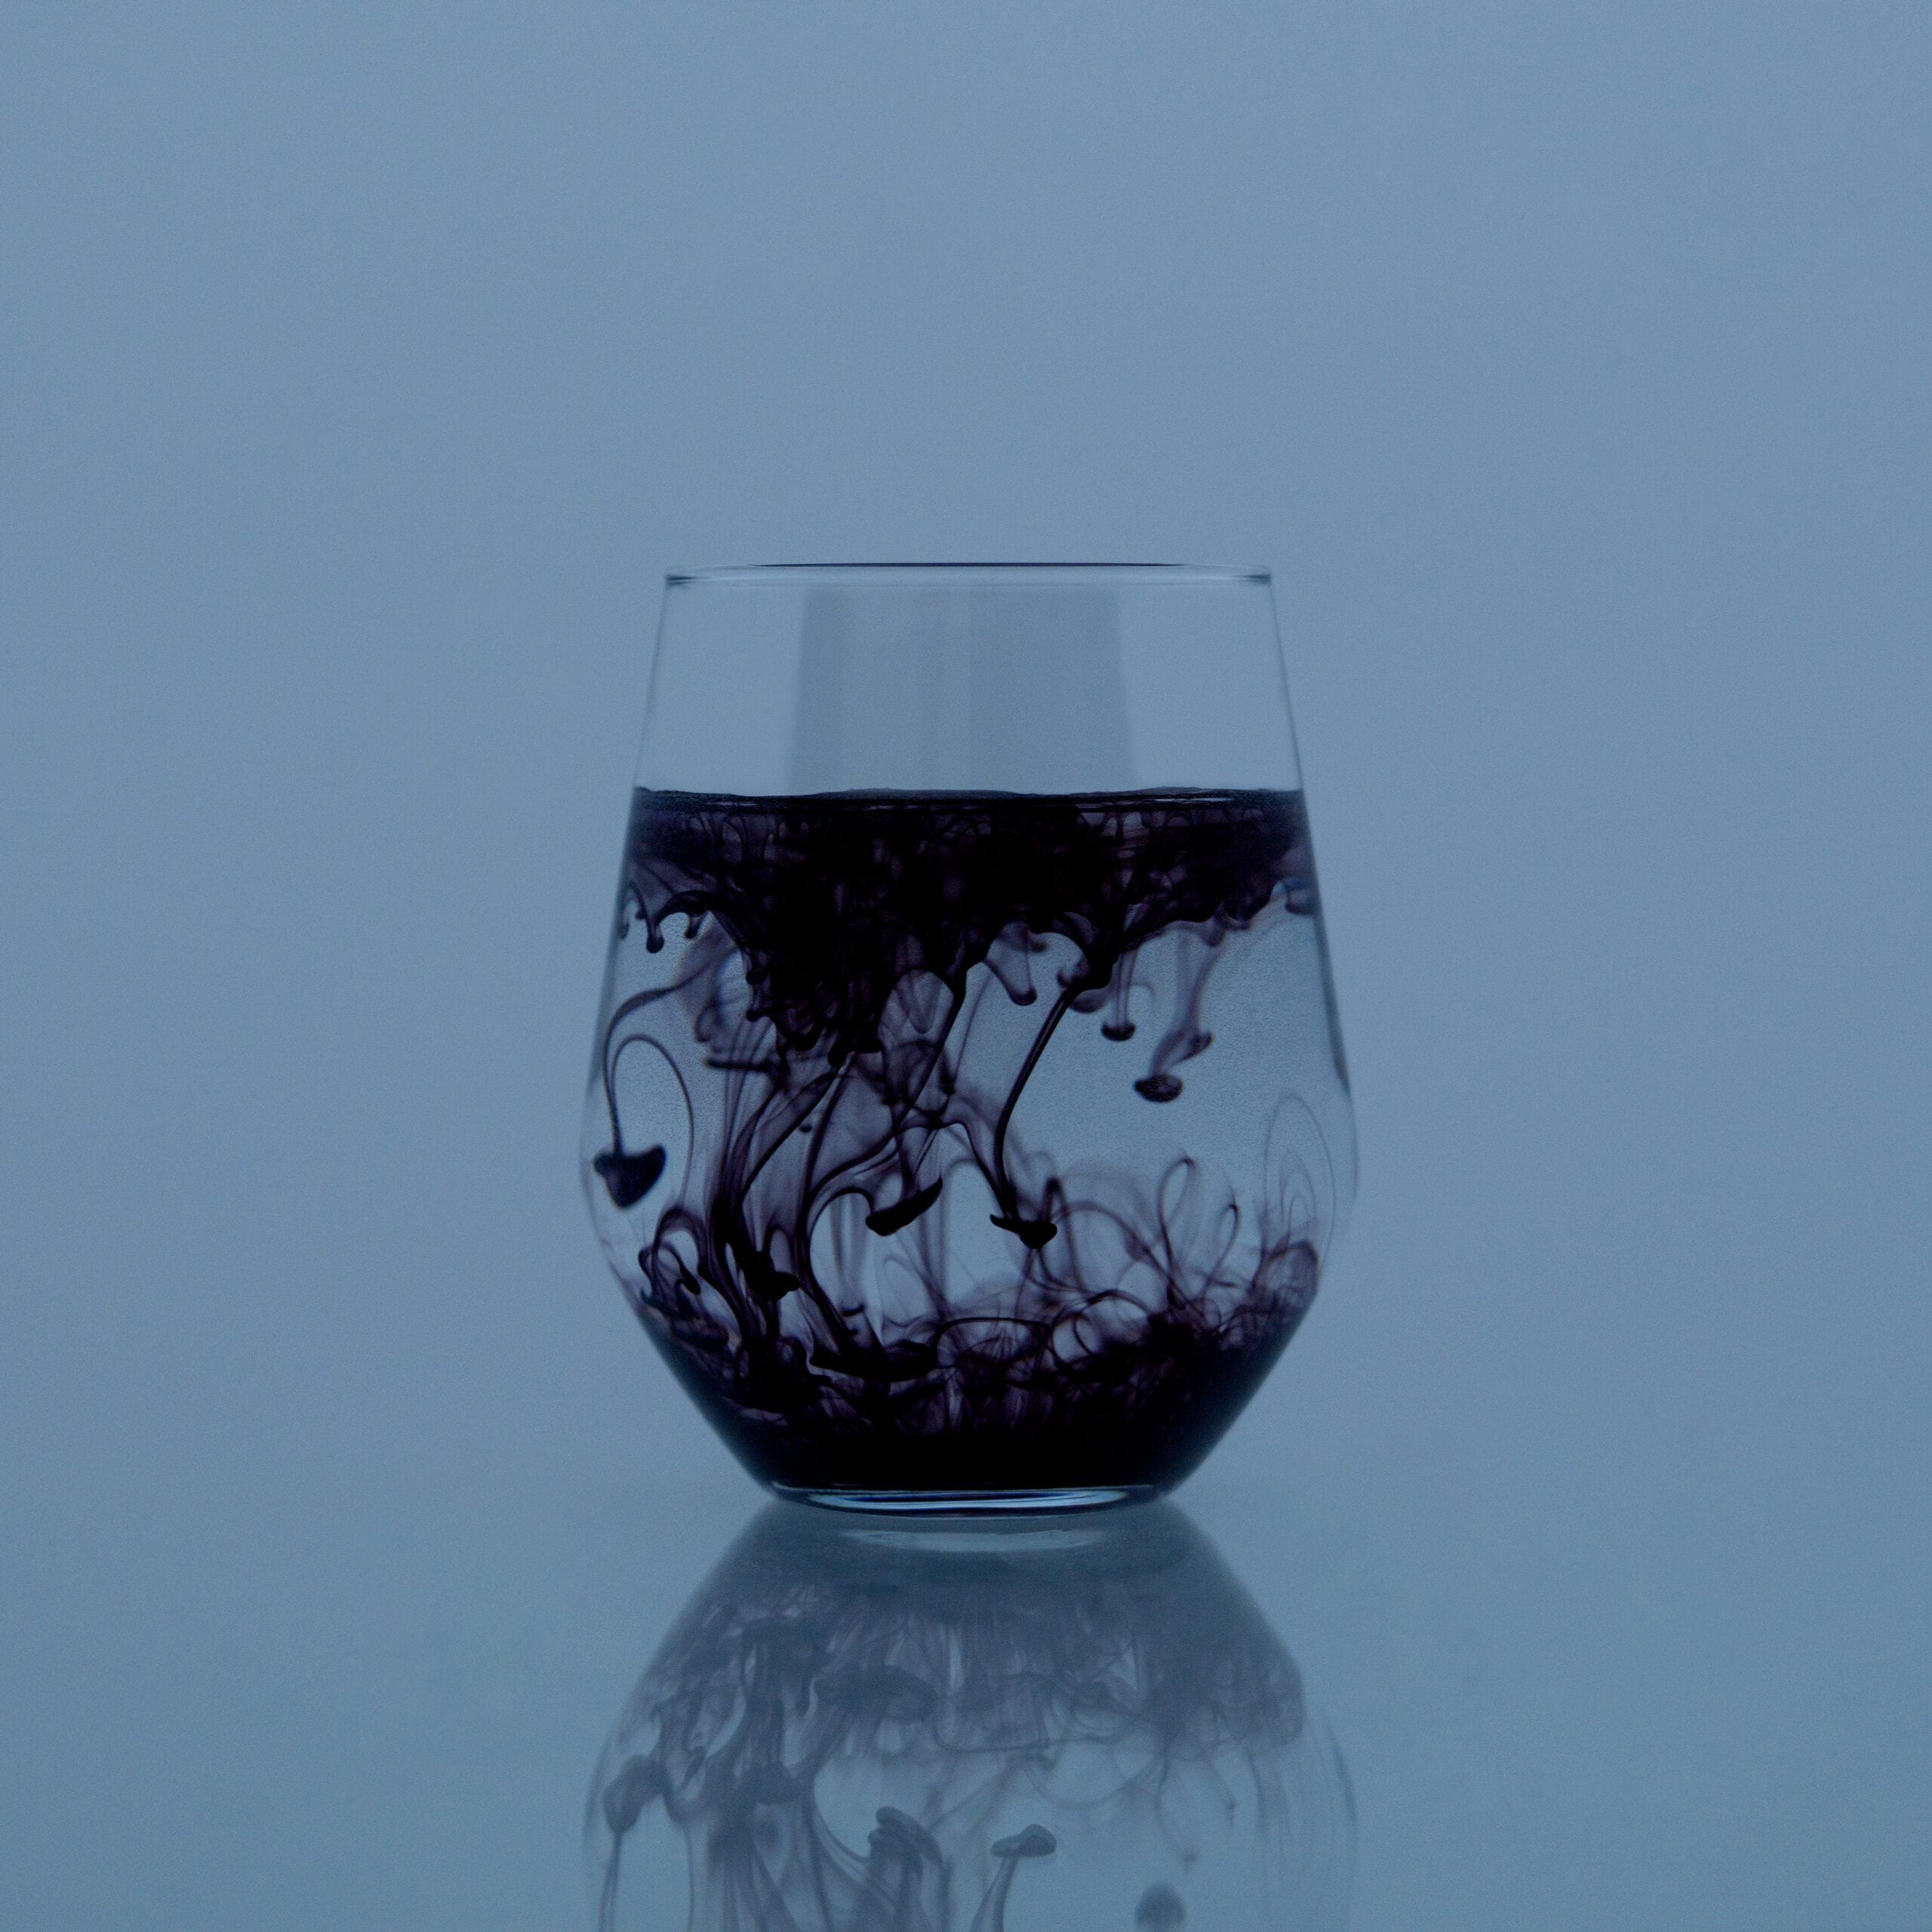 Darkness cup IG 2